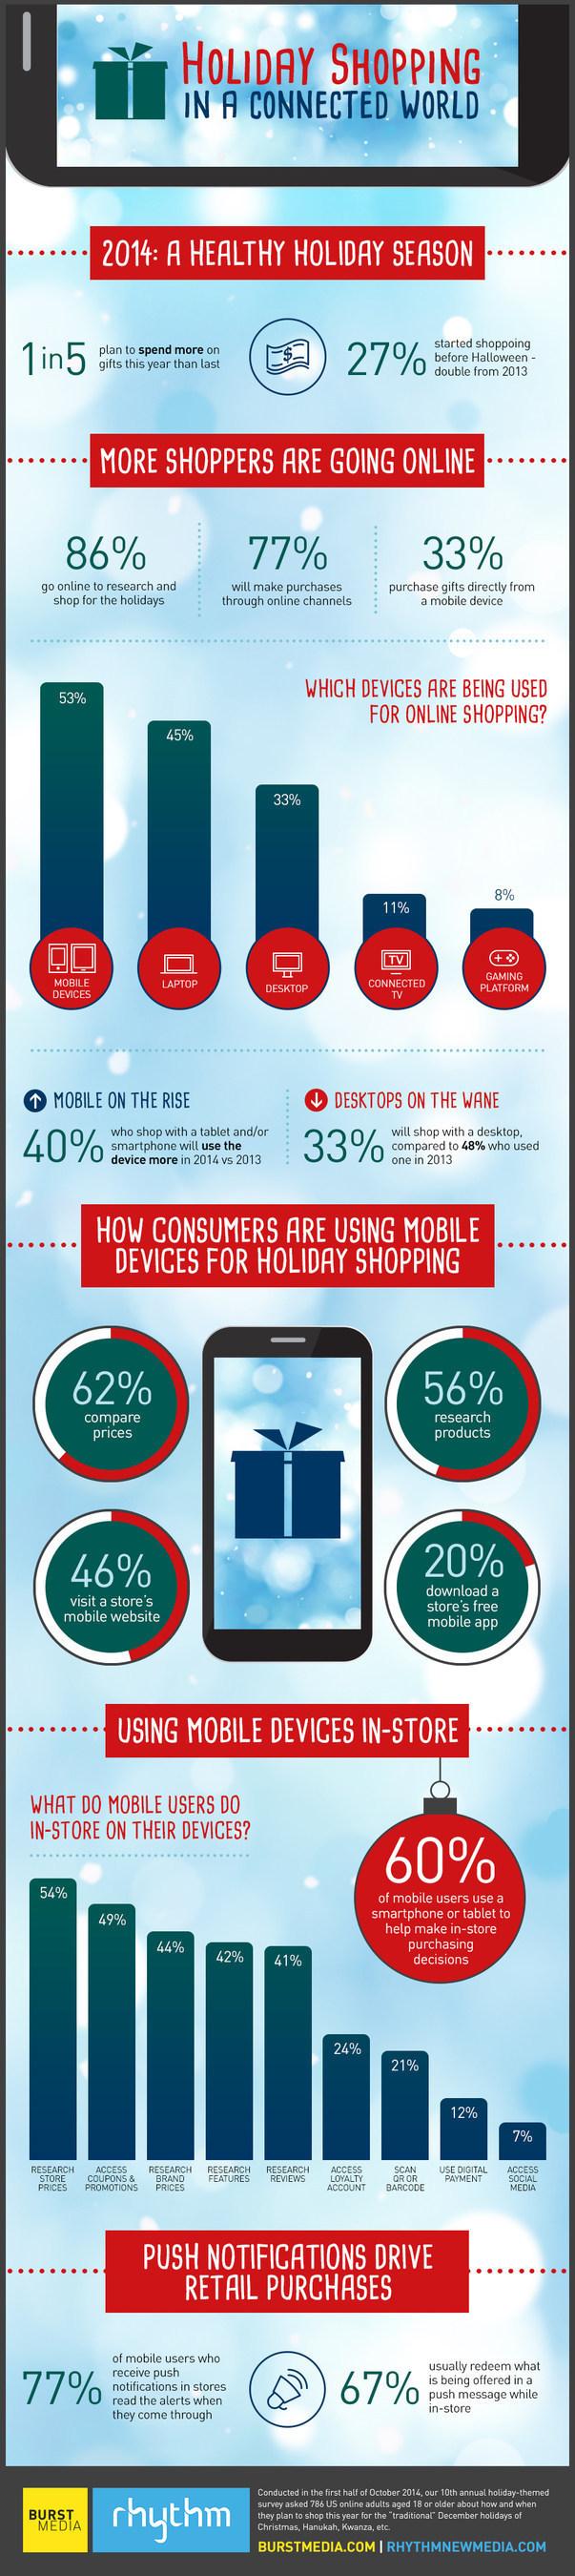 Burst Media and Rhythm NewMedia Present Their Annual Holiday Shopping Survey.